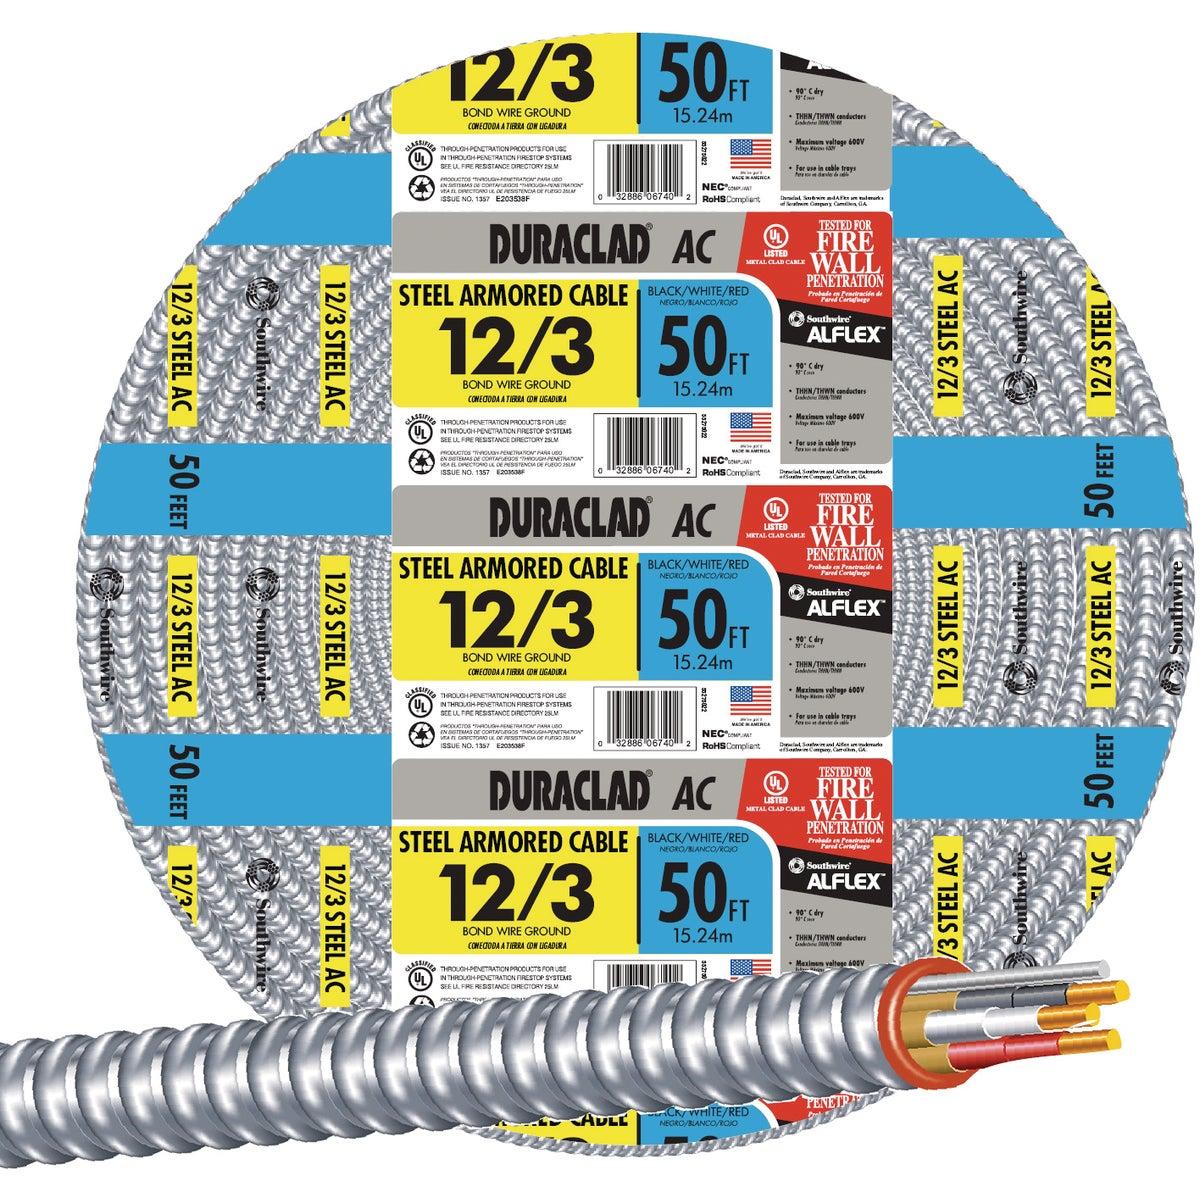 50' 12/3 STL ARMOR CABLE